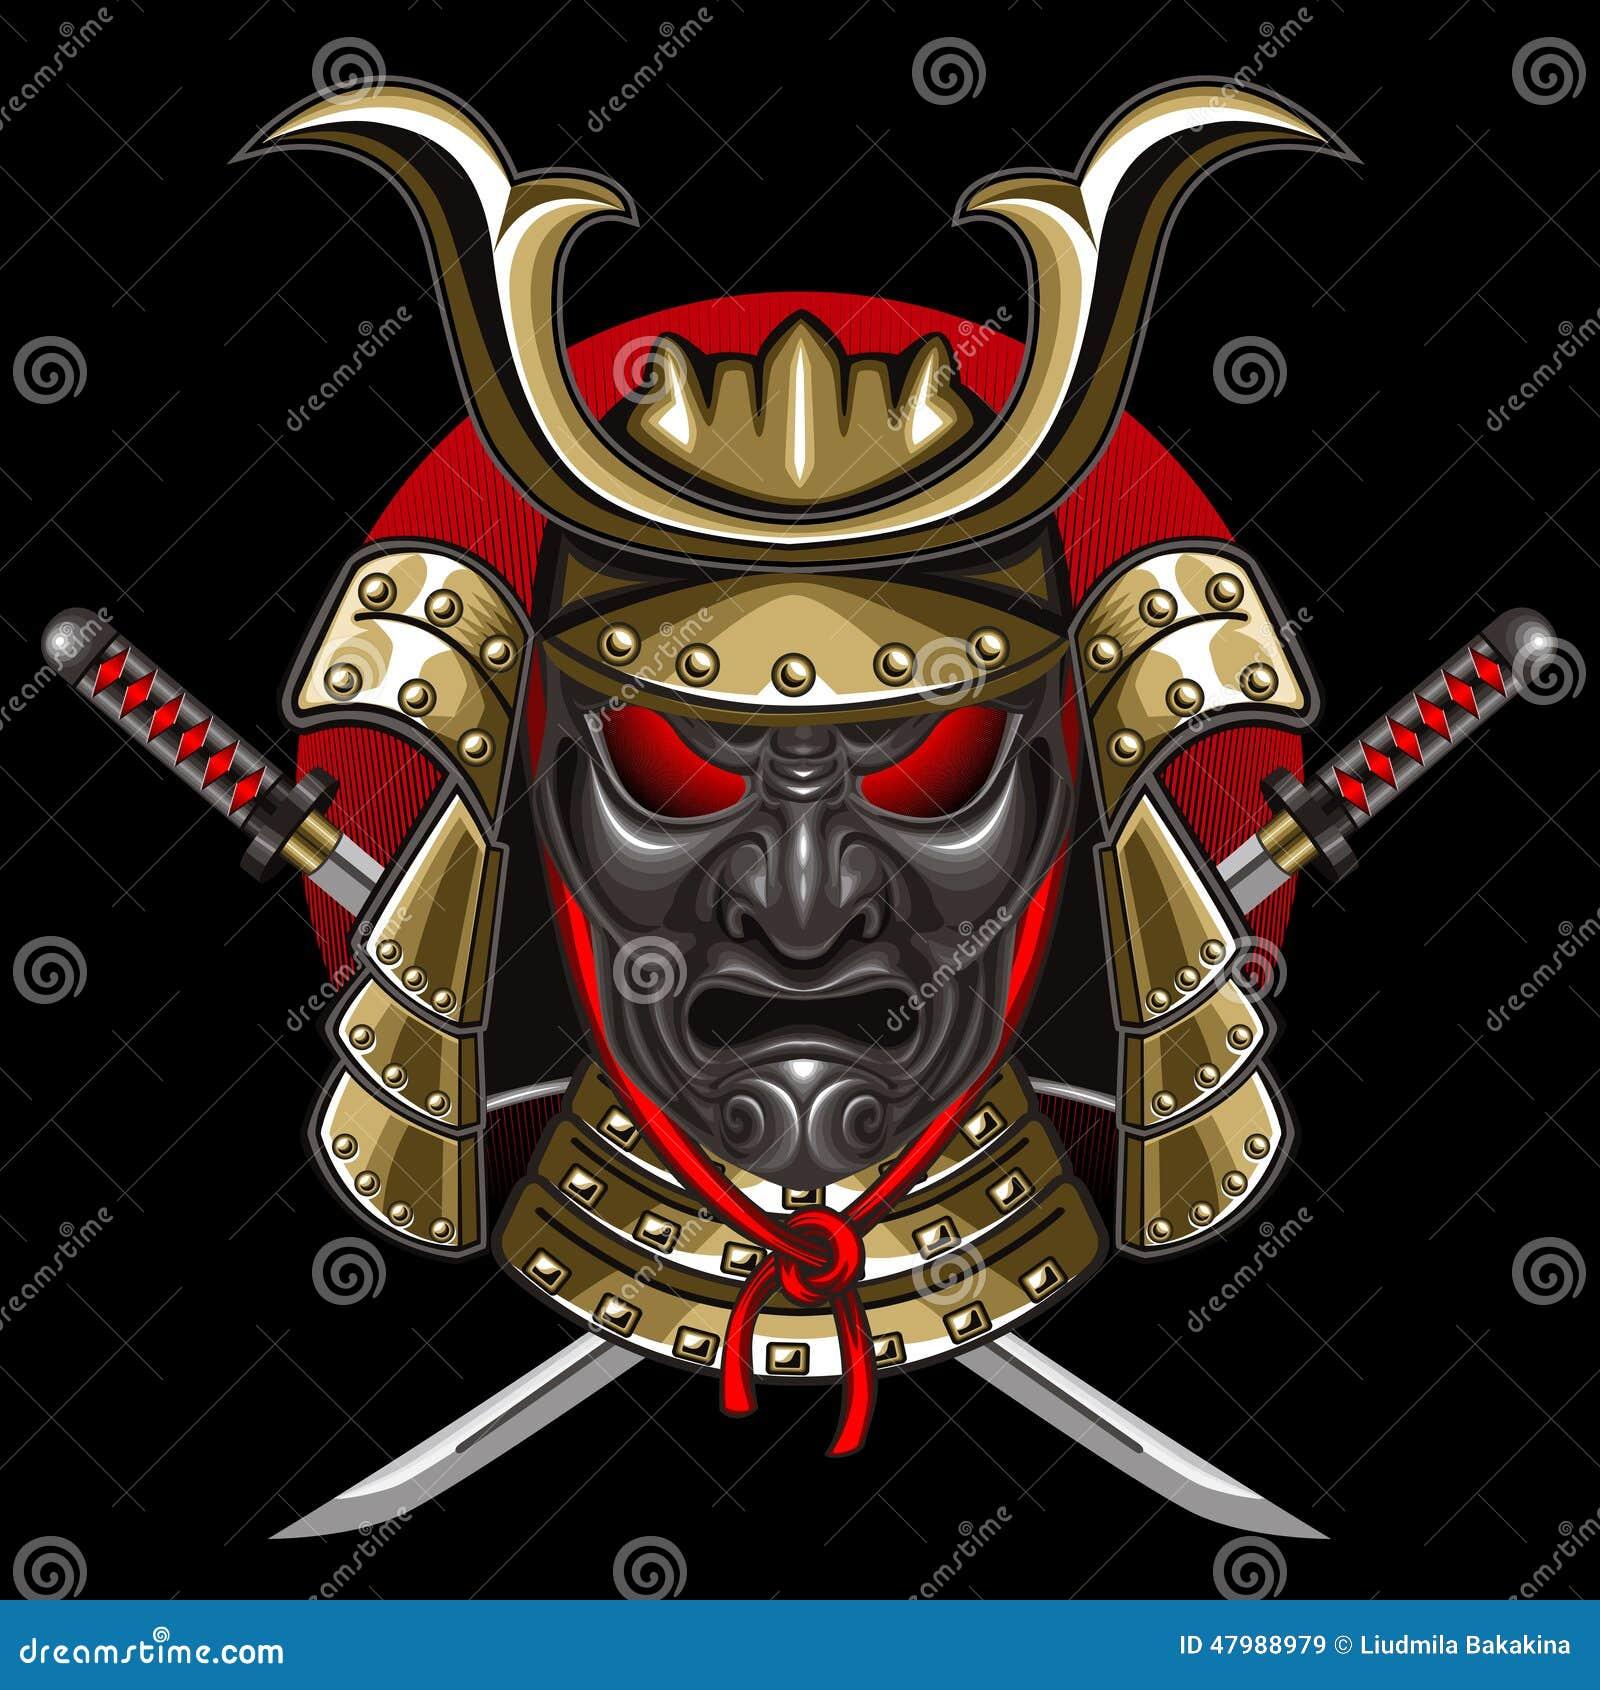 http://thumbs.dreamstime.com/z/samurai-de-la-m%C3%A1scara-con-katana-47988979.jpg